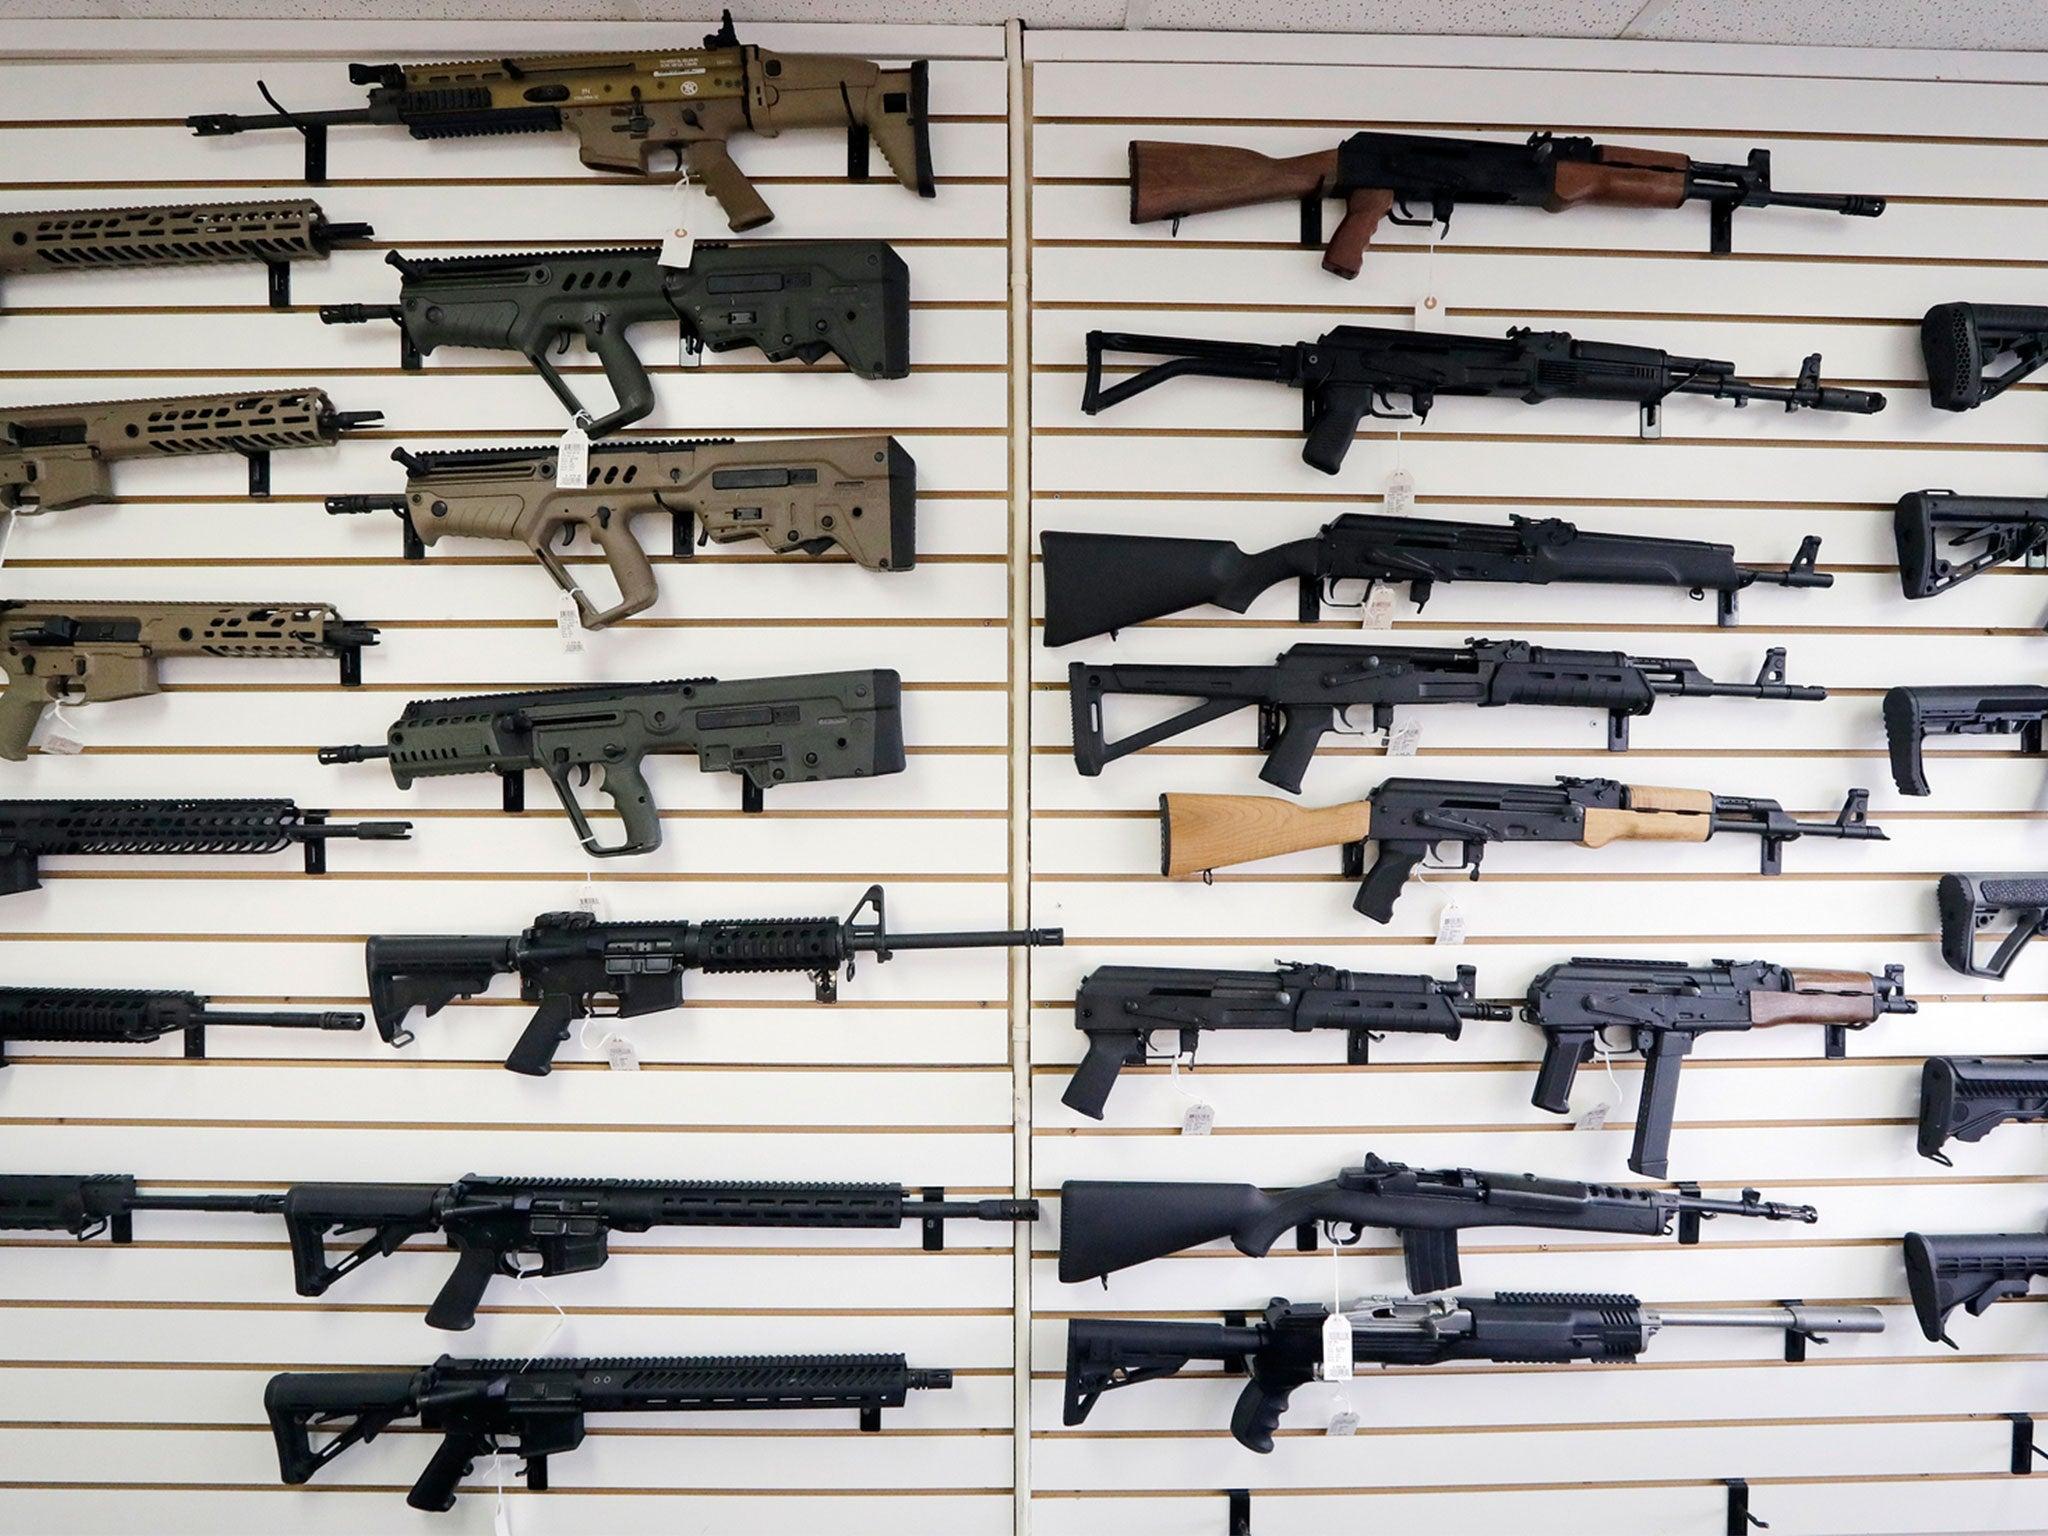 Sheriffs refusing to enforce new Washington state rules on semi-automatic weapons